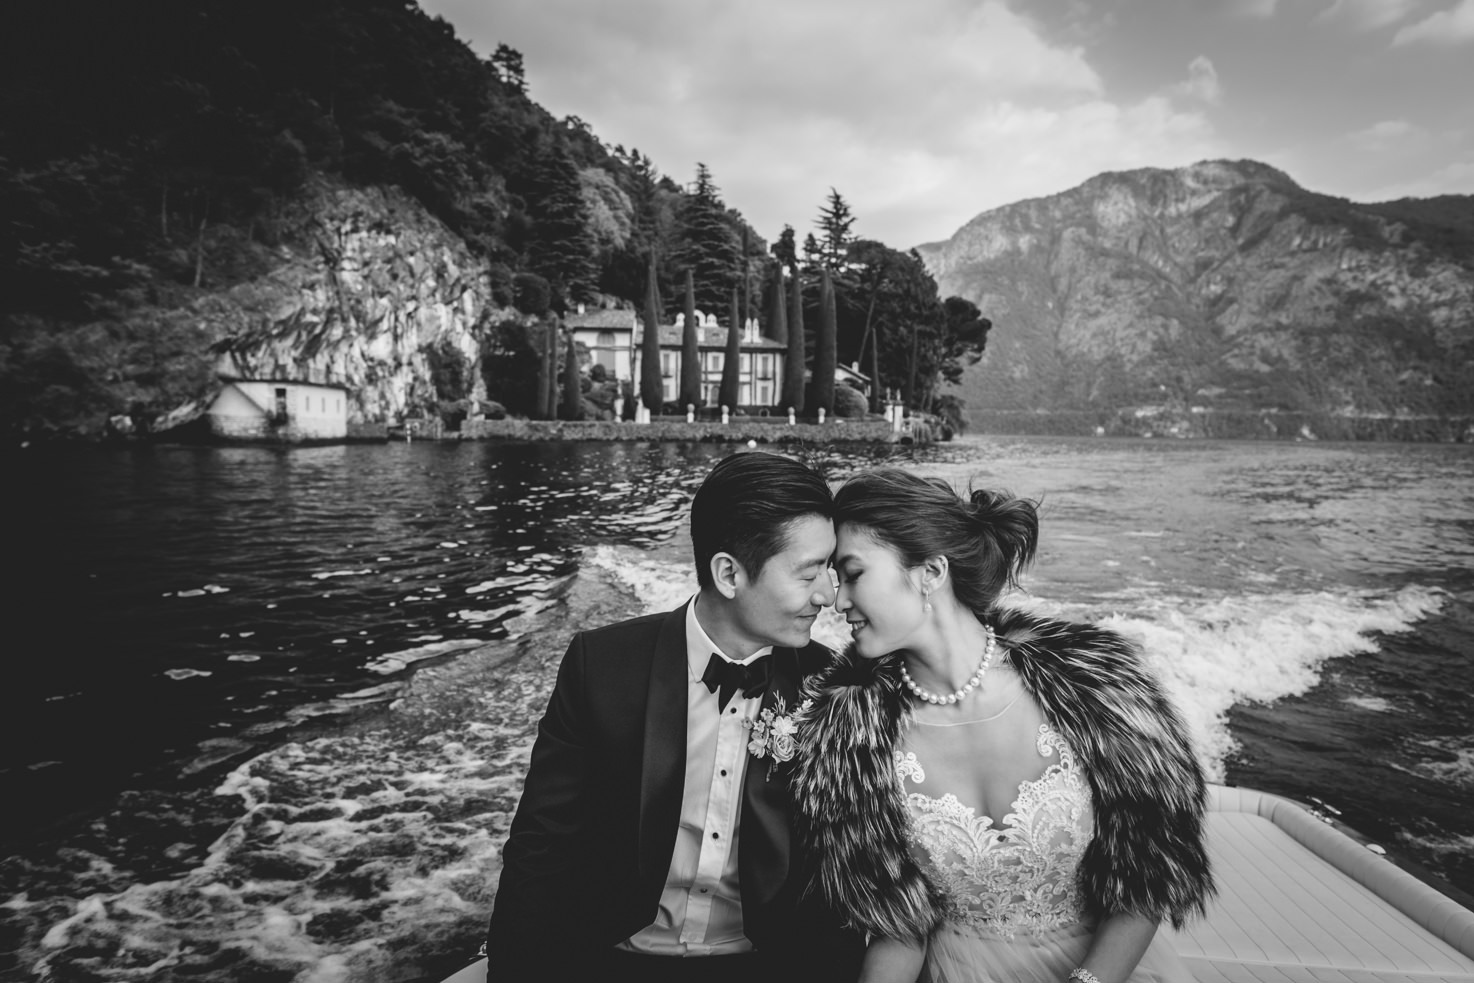 Destination wedding on Lake Como